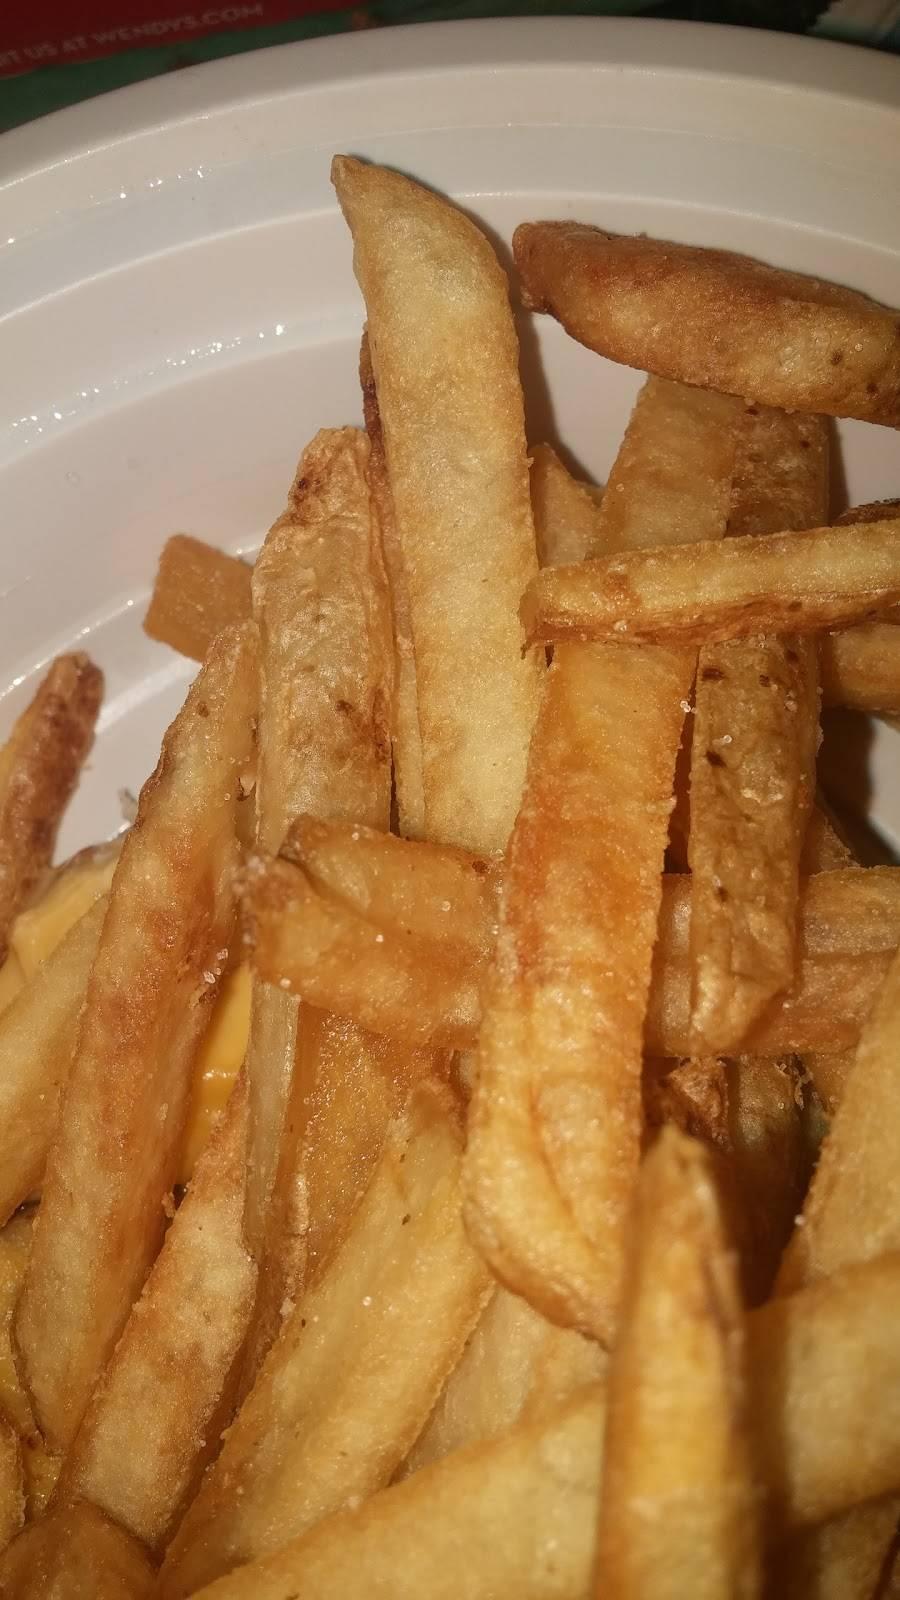 Wendys | restaurant | 2-30 Garfield Ave, Jersey City, NJ 07305, USA | 2014333950 OR +1 201-433-3950